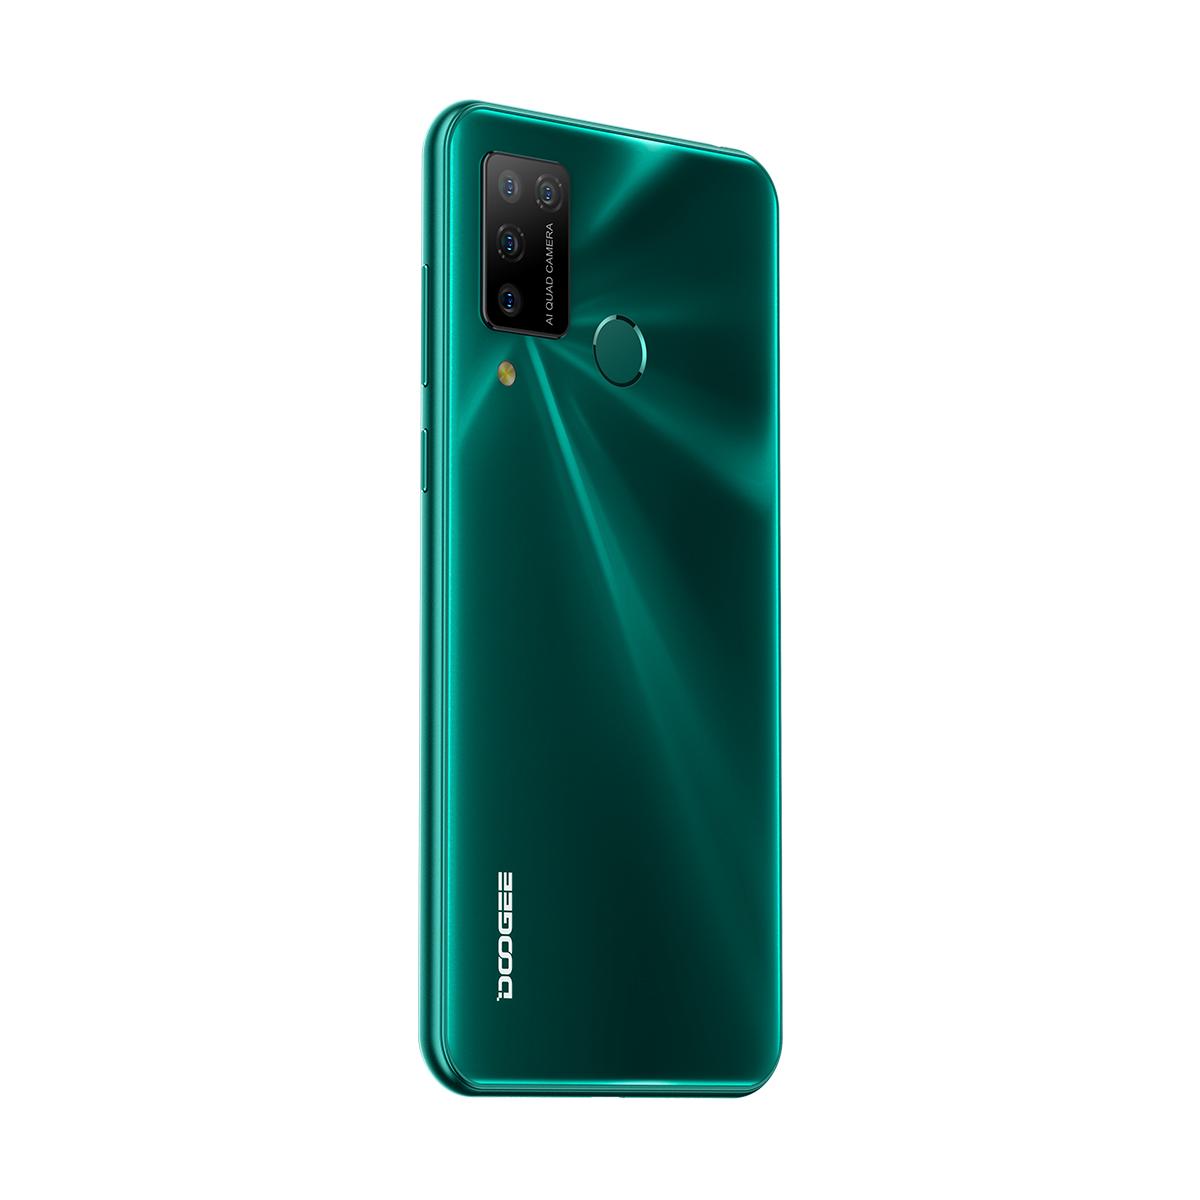 Doogee N20 Pro 6GB/128GB Fantasy Forest Green